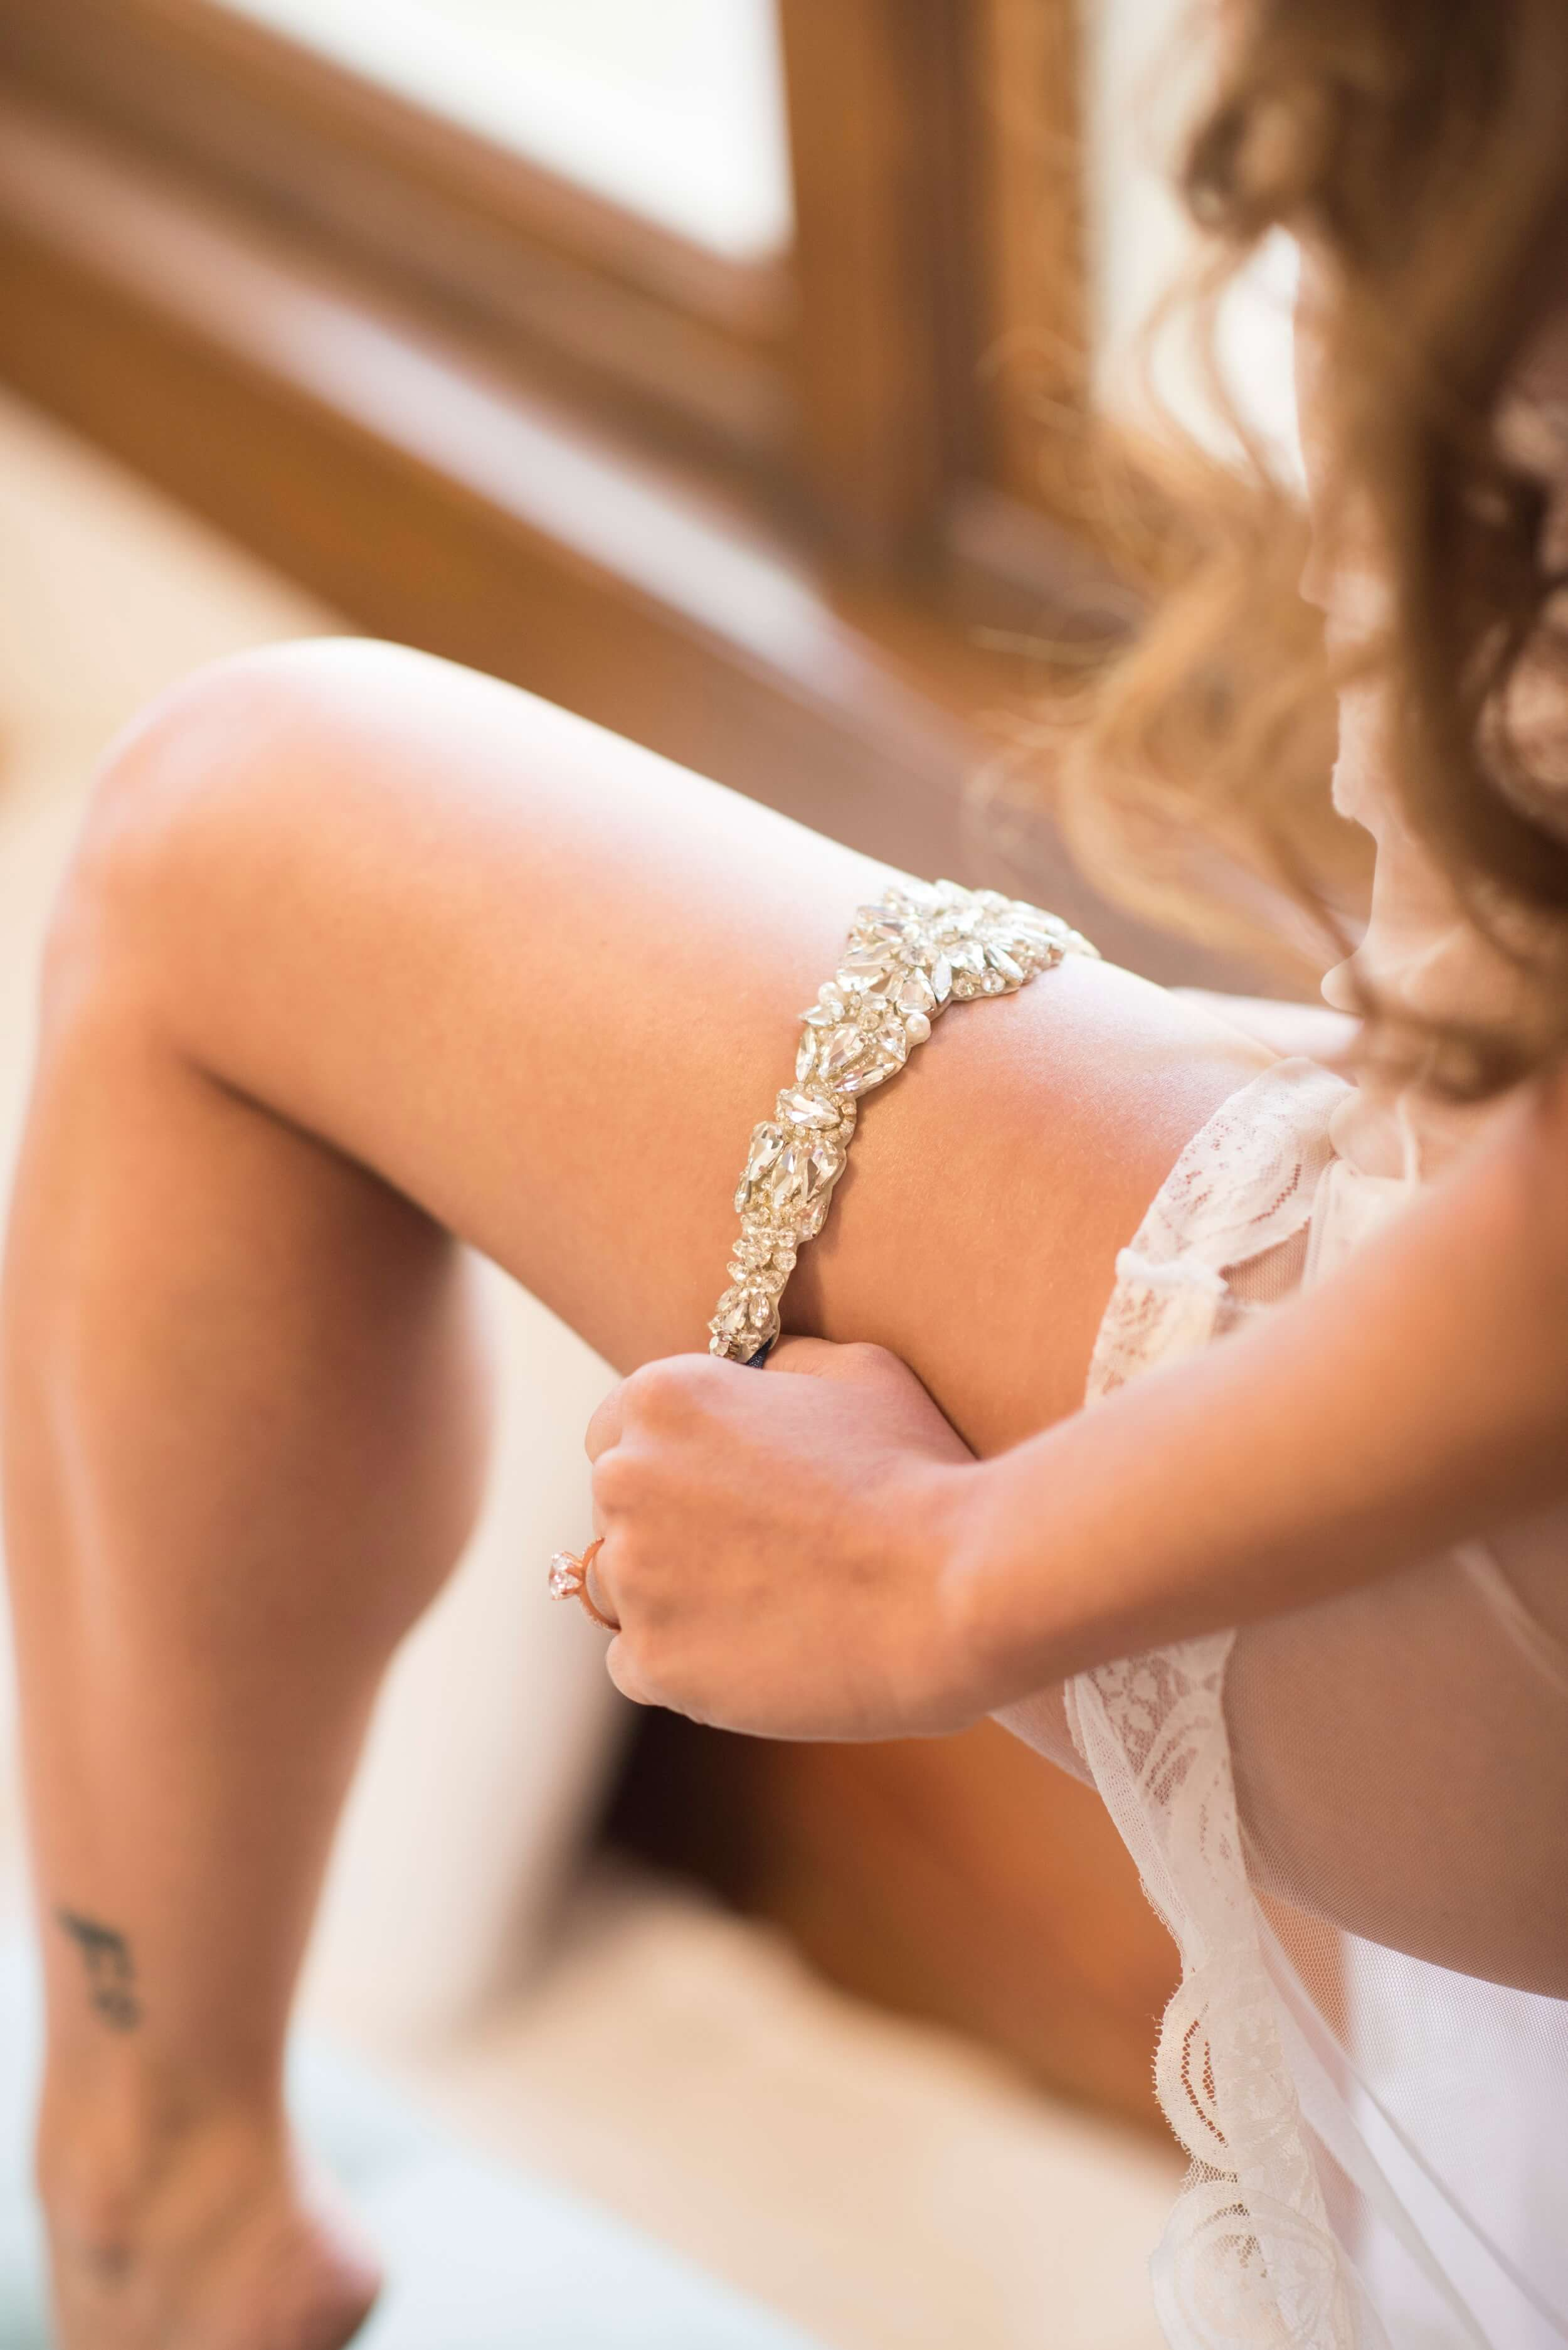 Bridal Boudoir by Graciela Valdes Photography (4).jpg